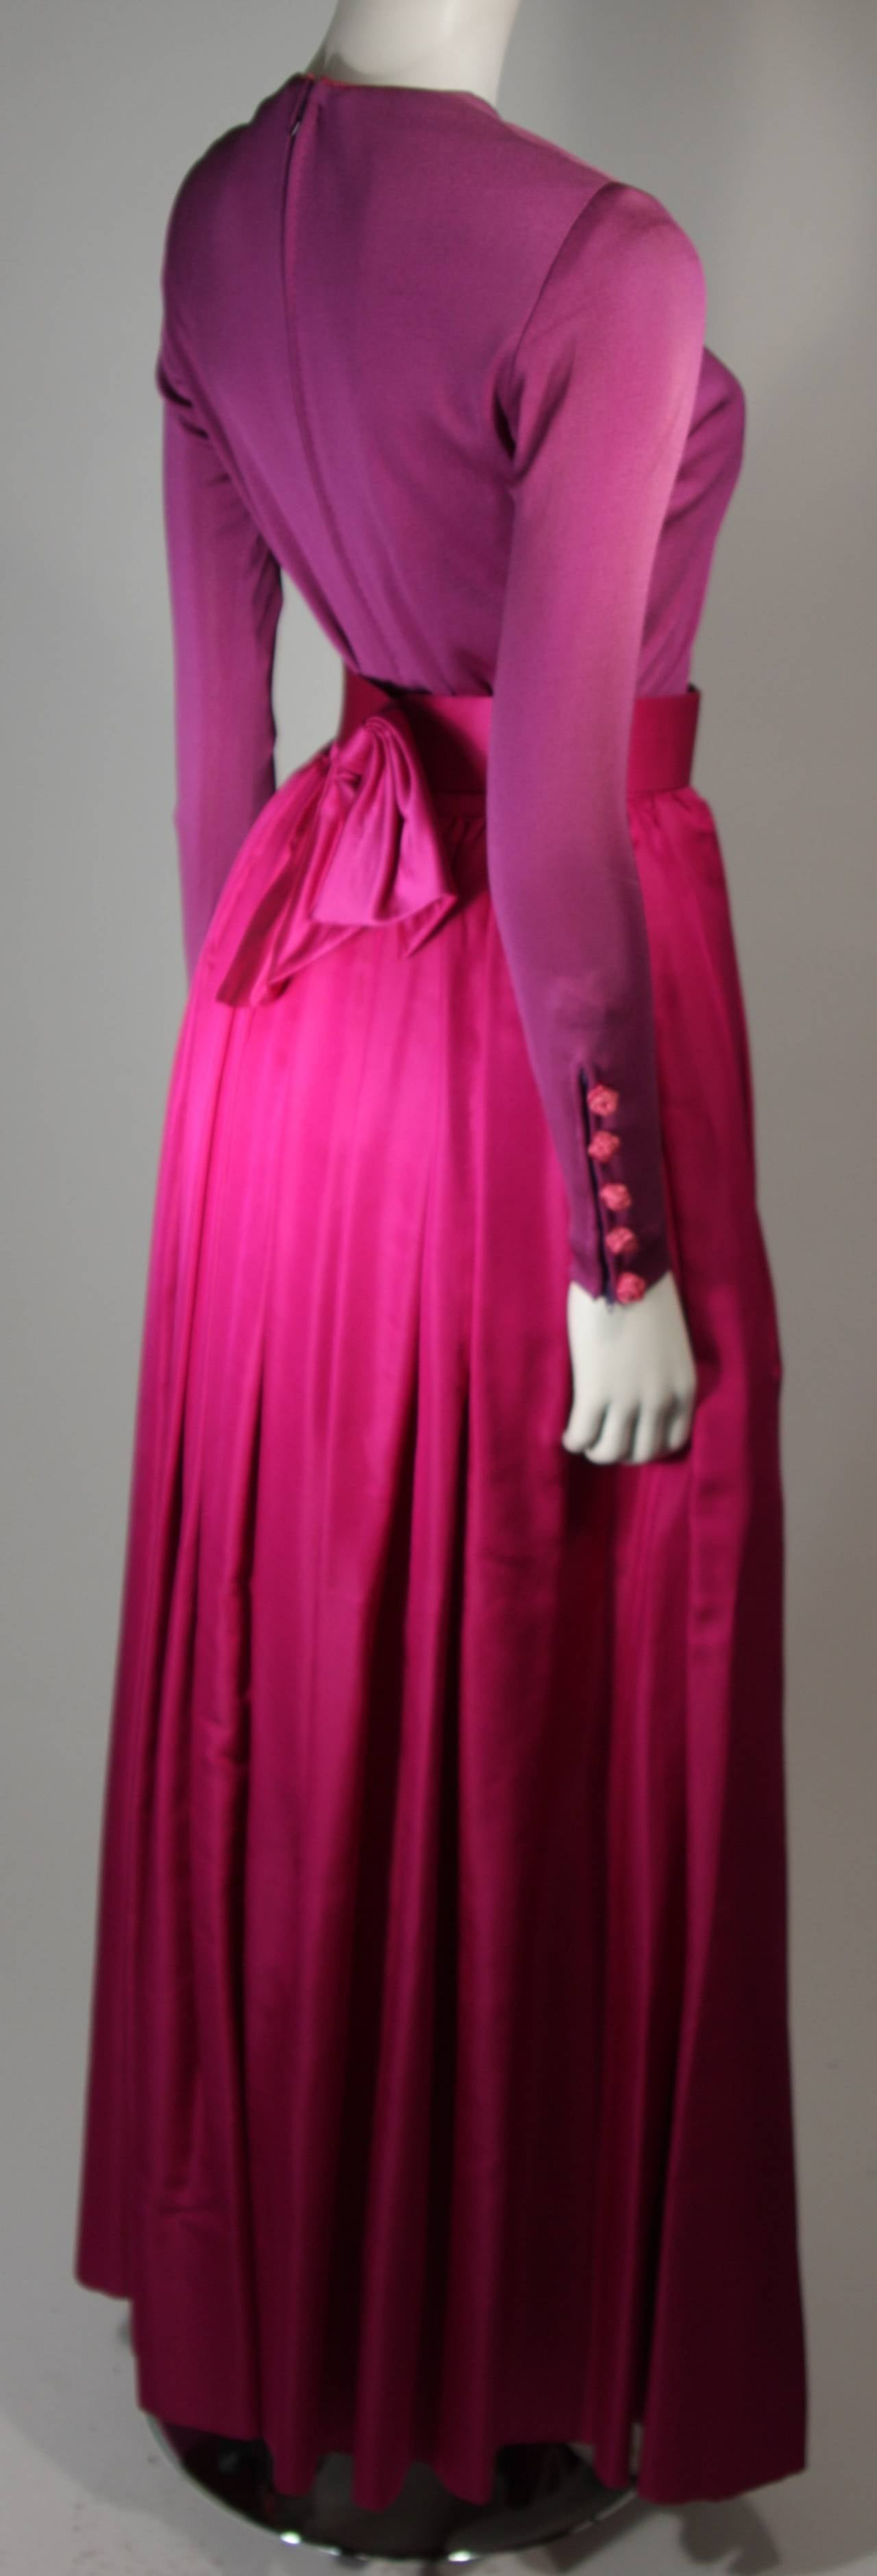 Bob Mackie Evening Skirt Set Ensemble in Purple Size Small 6